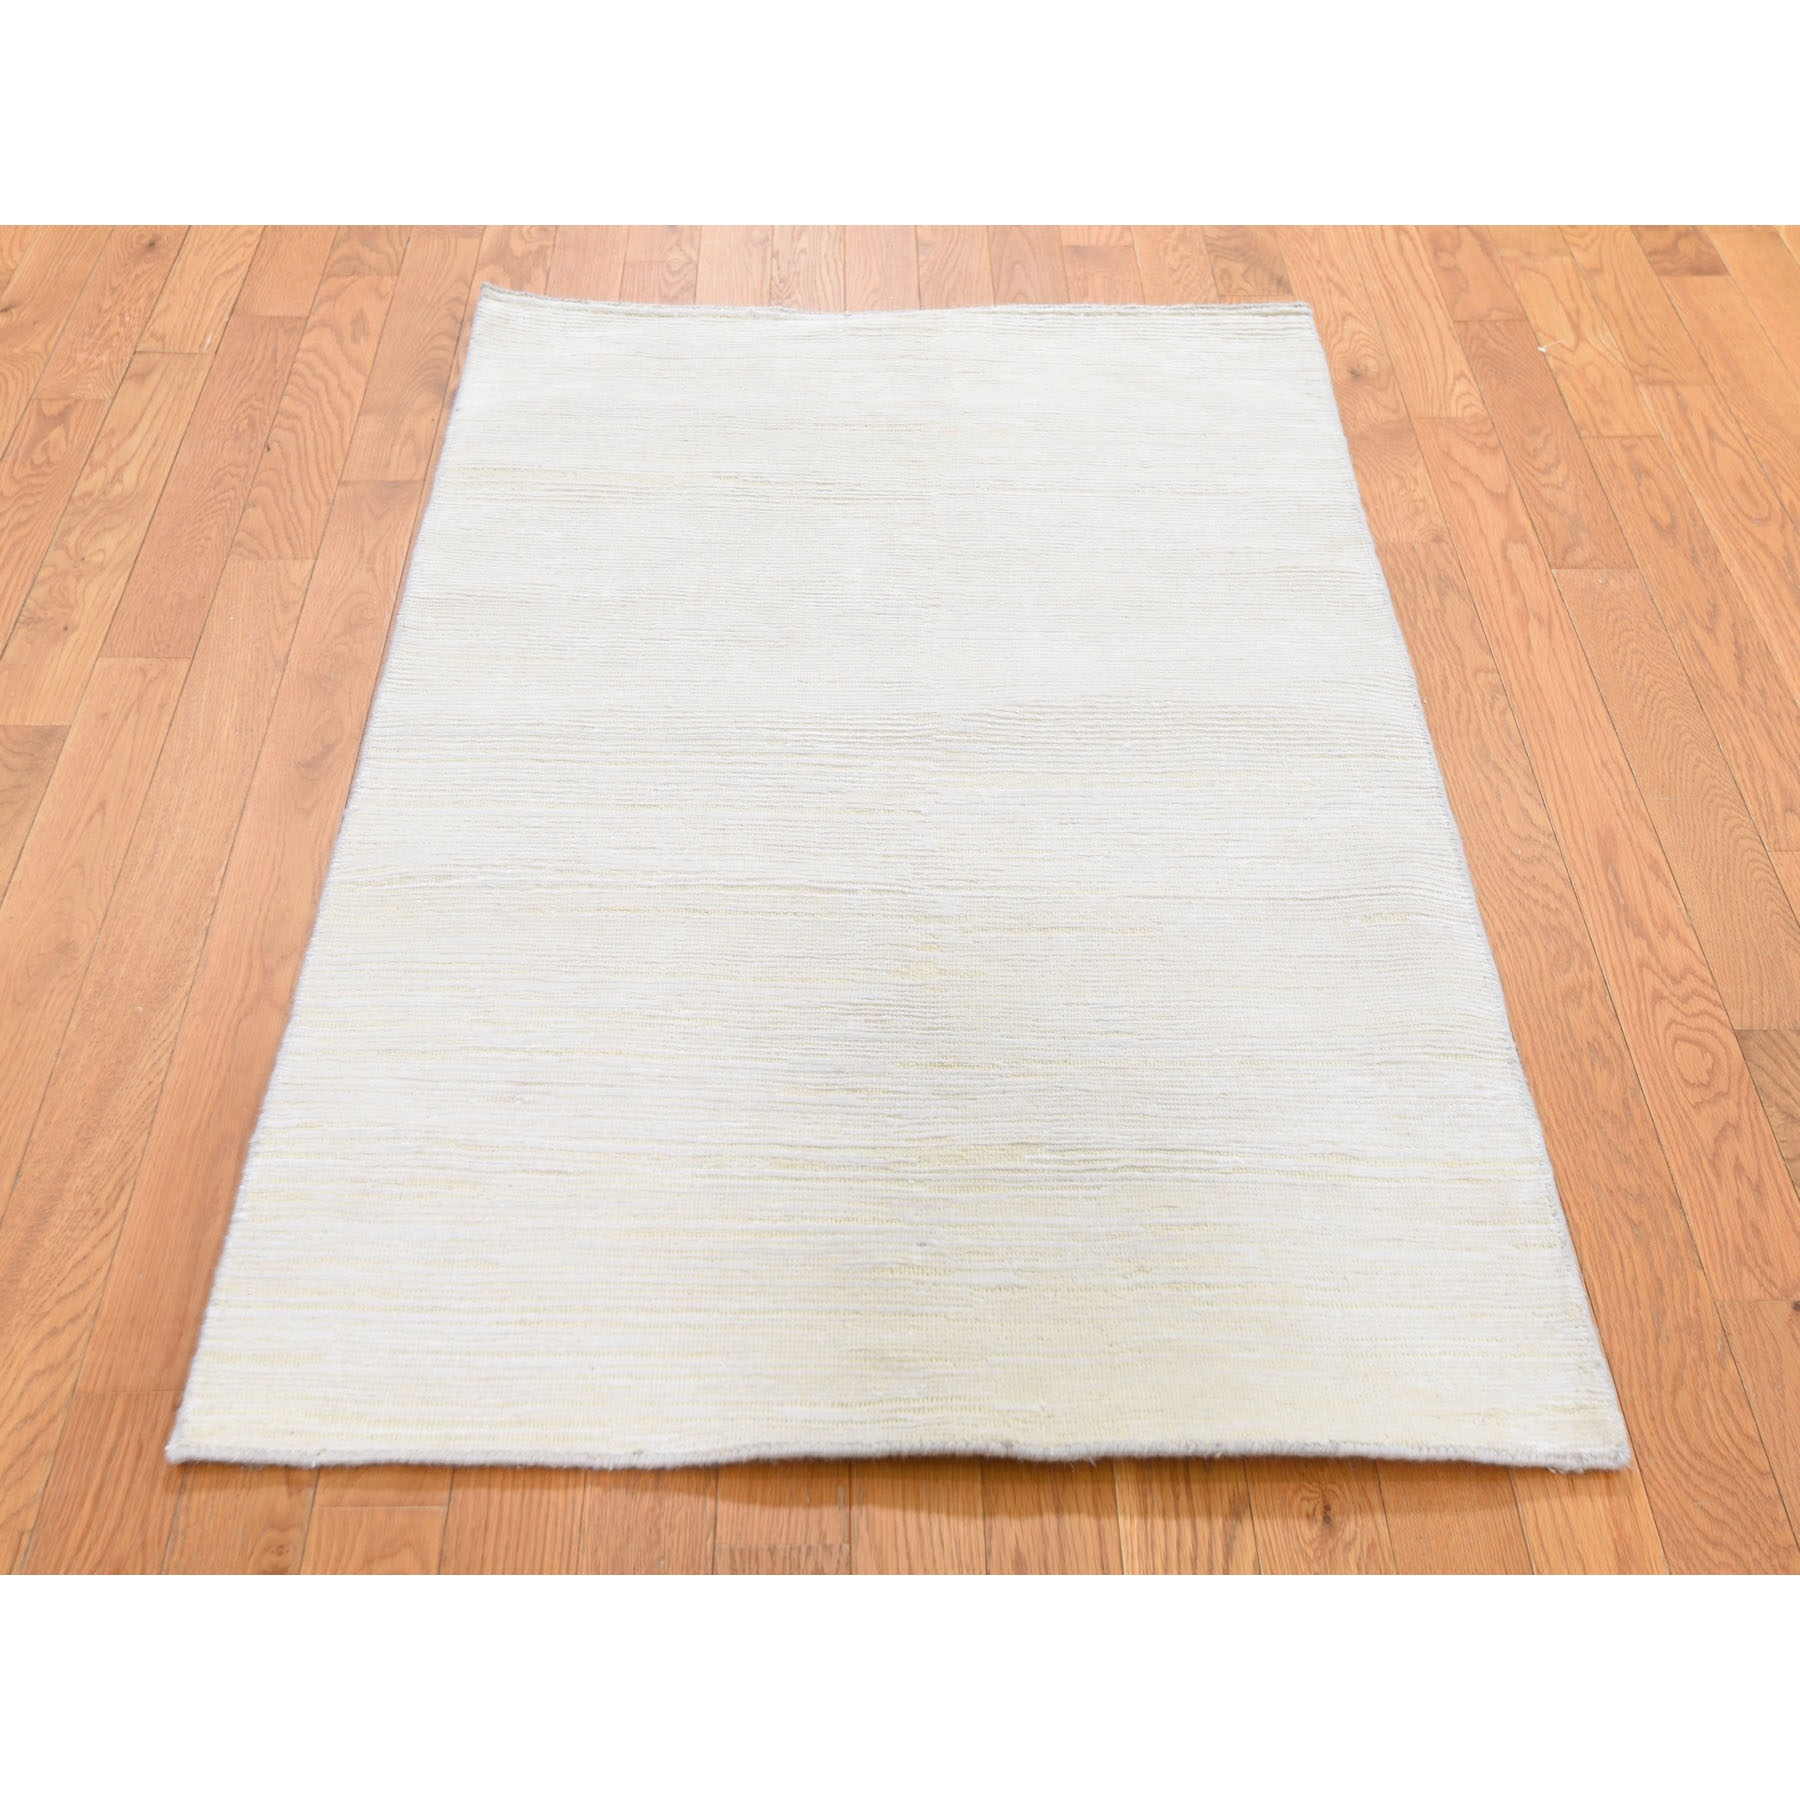 3'x5' Silk with Textured Wool Tone on Tone Gabbeh Design Oriental Rug